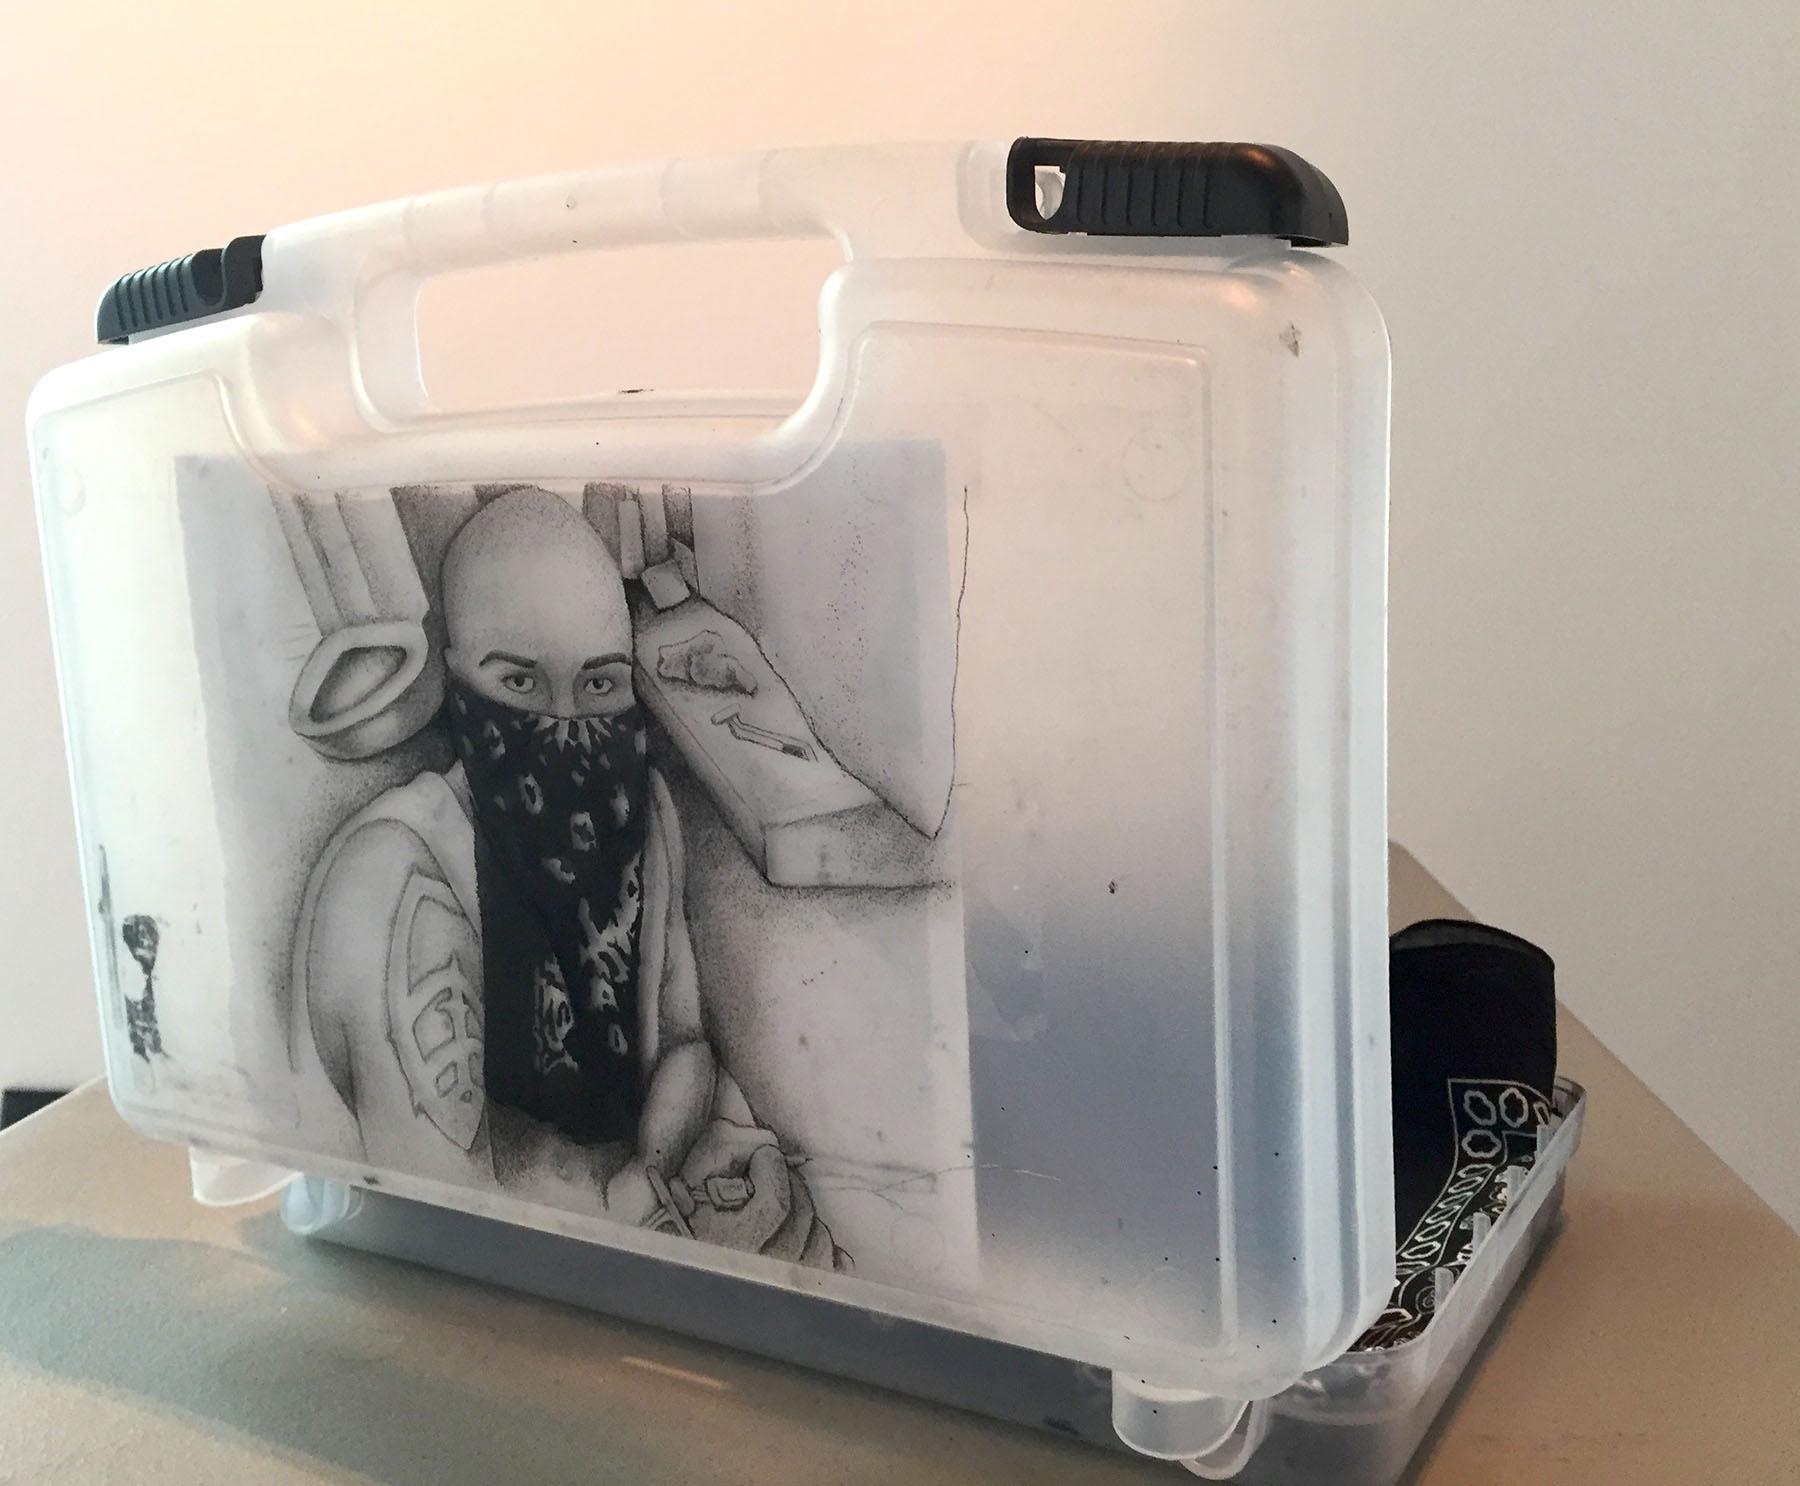 Courtesy art of the Student Art Exhibition. Alberto Lule, Self-Portrait in Prison, Tattooed ink on art kit